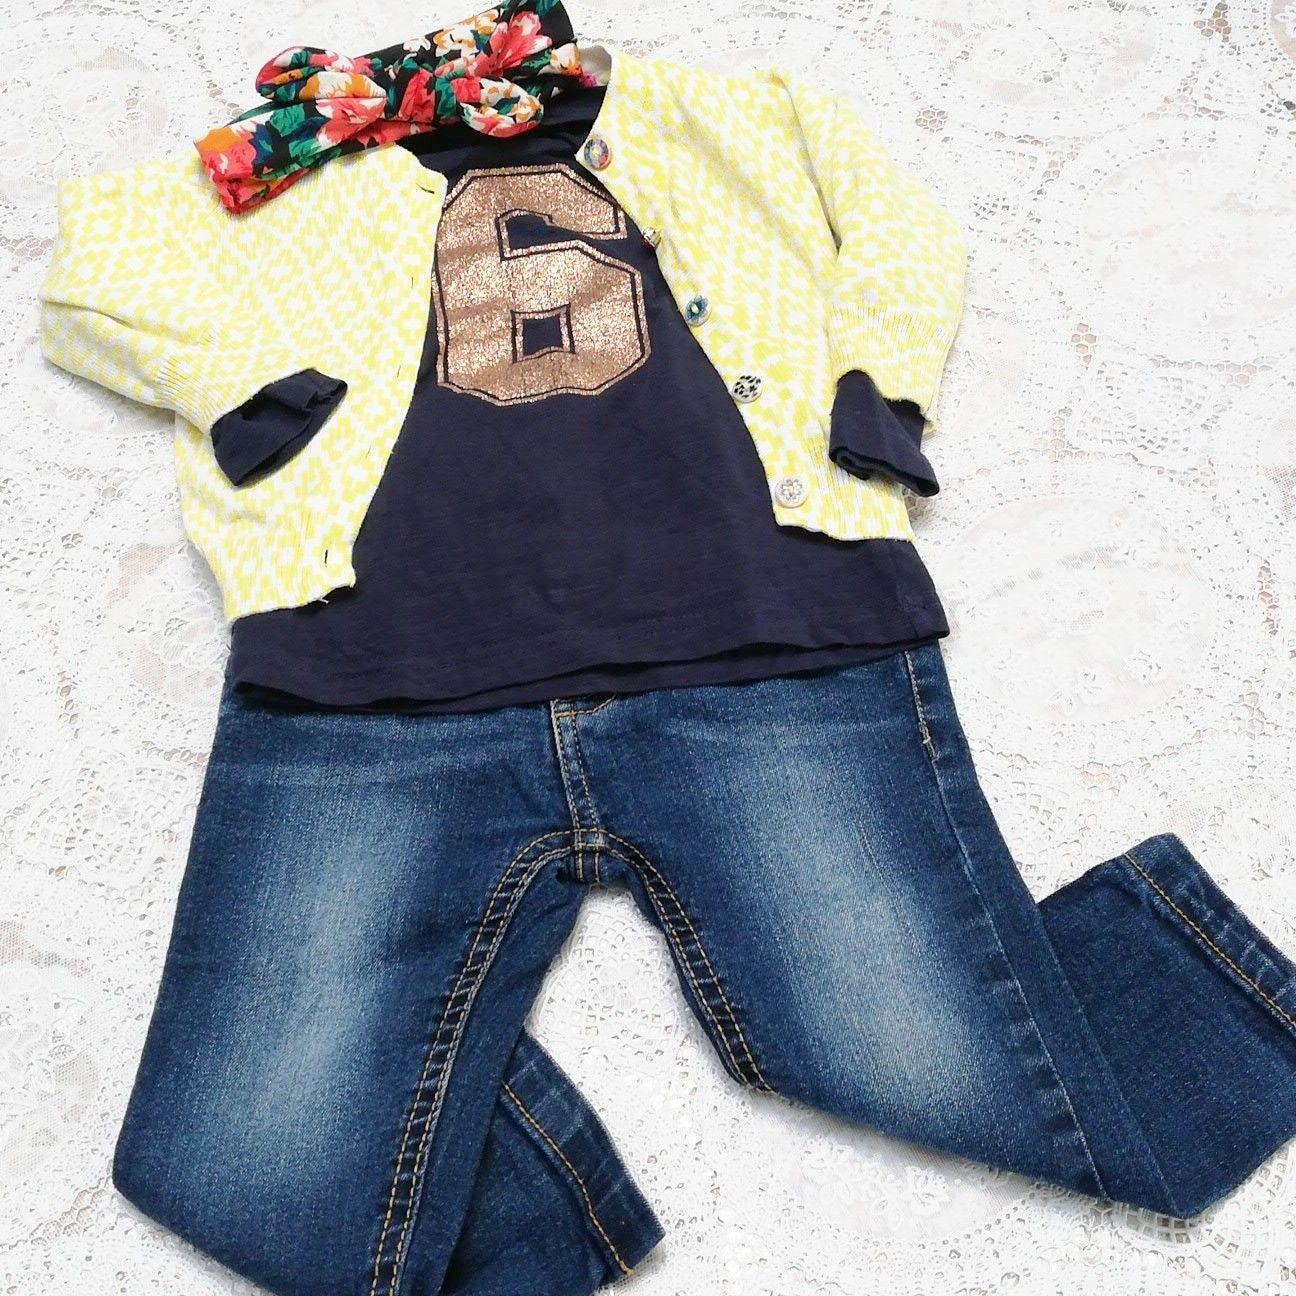 Tweedehands Merk Kinderkleding.Bij Sanne Tweedehands Merk Kinderkleding Tweedehands Kinderkleding